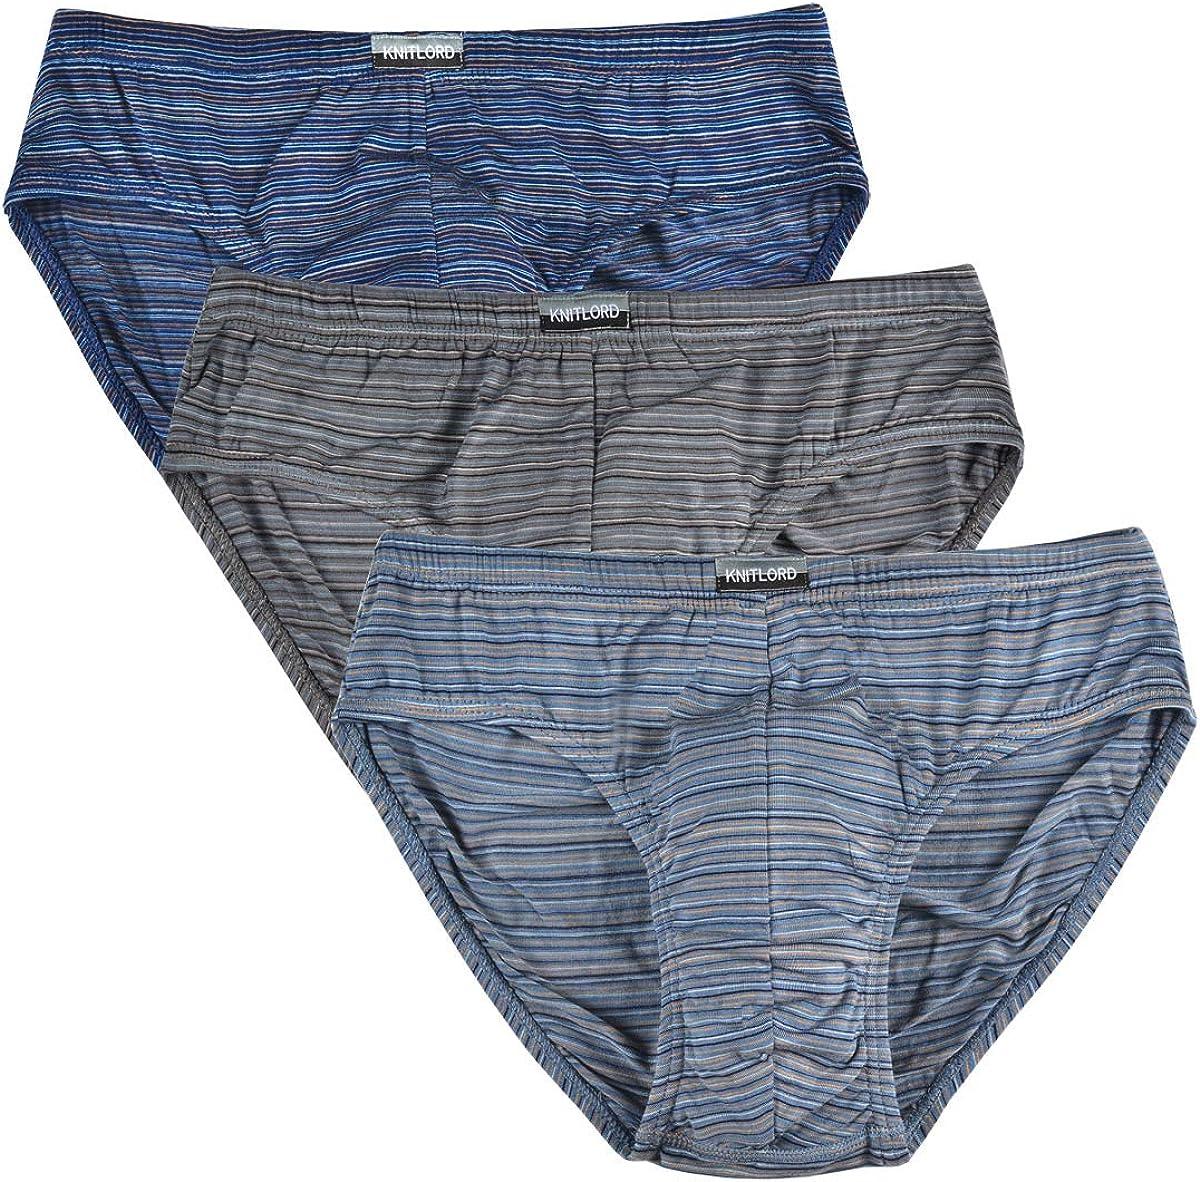 Men's Bamboo Underwear Soft Lightweight Mid/Low Rise Briefs 3 Pack